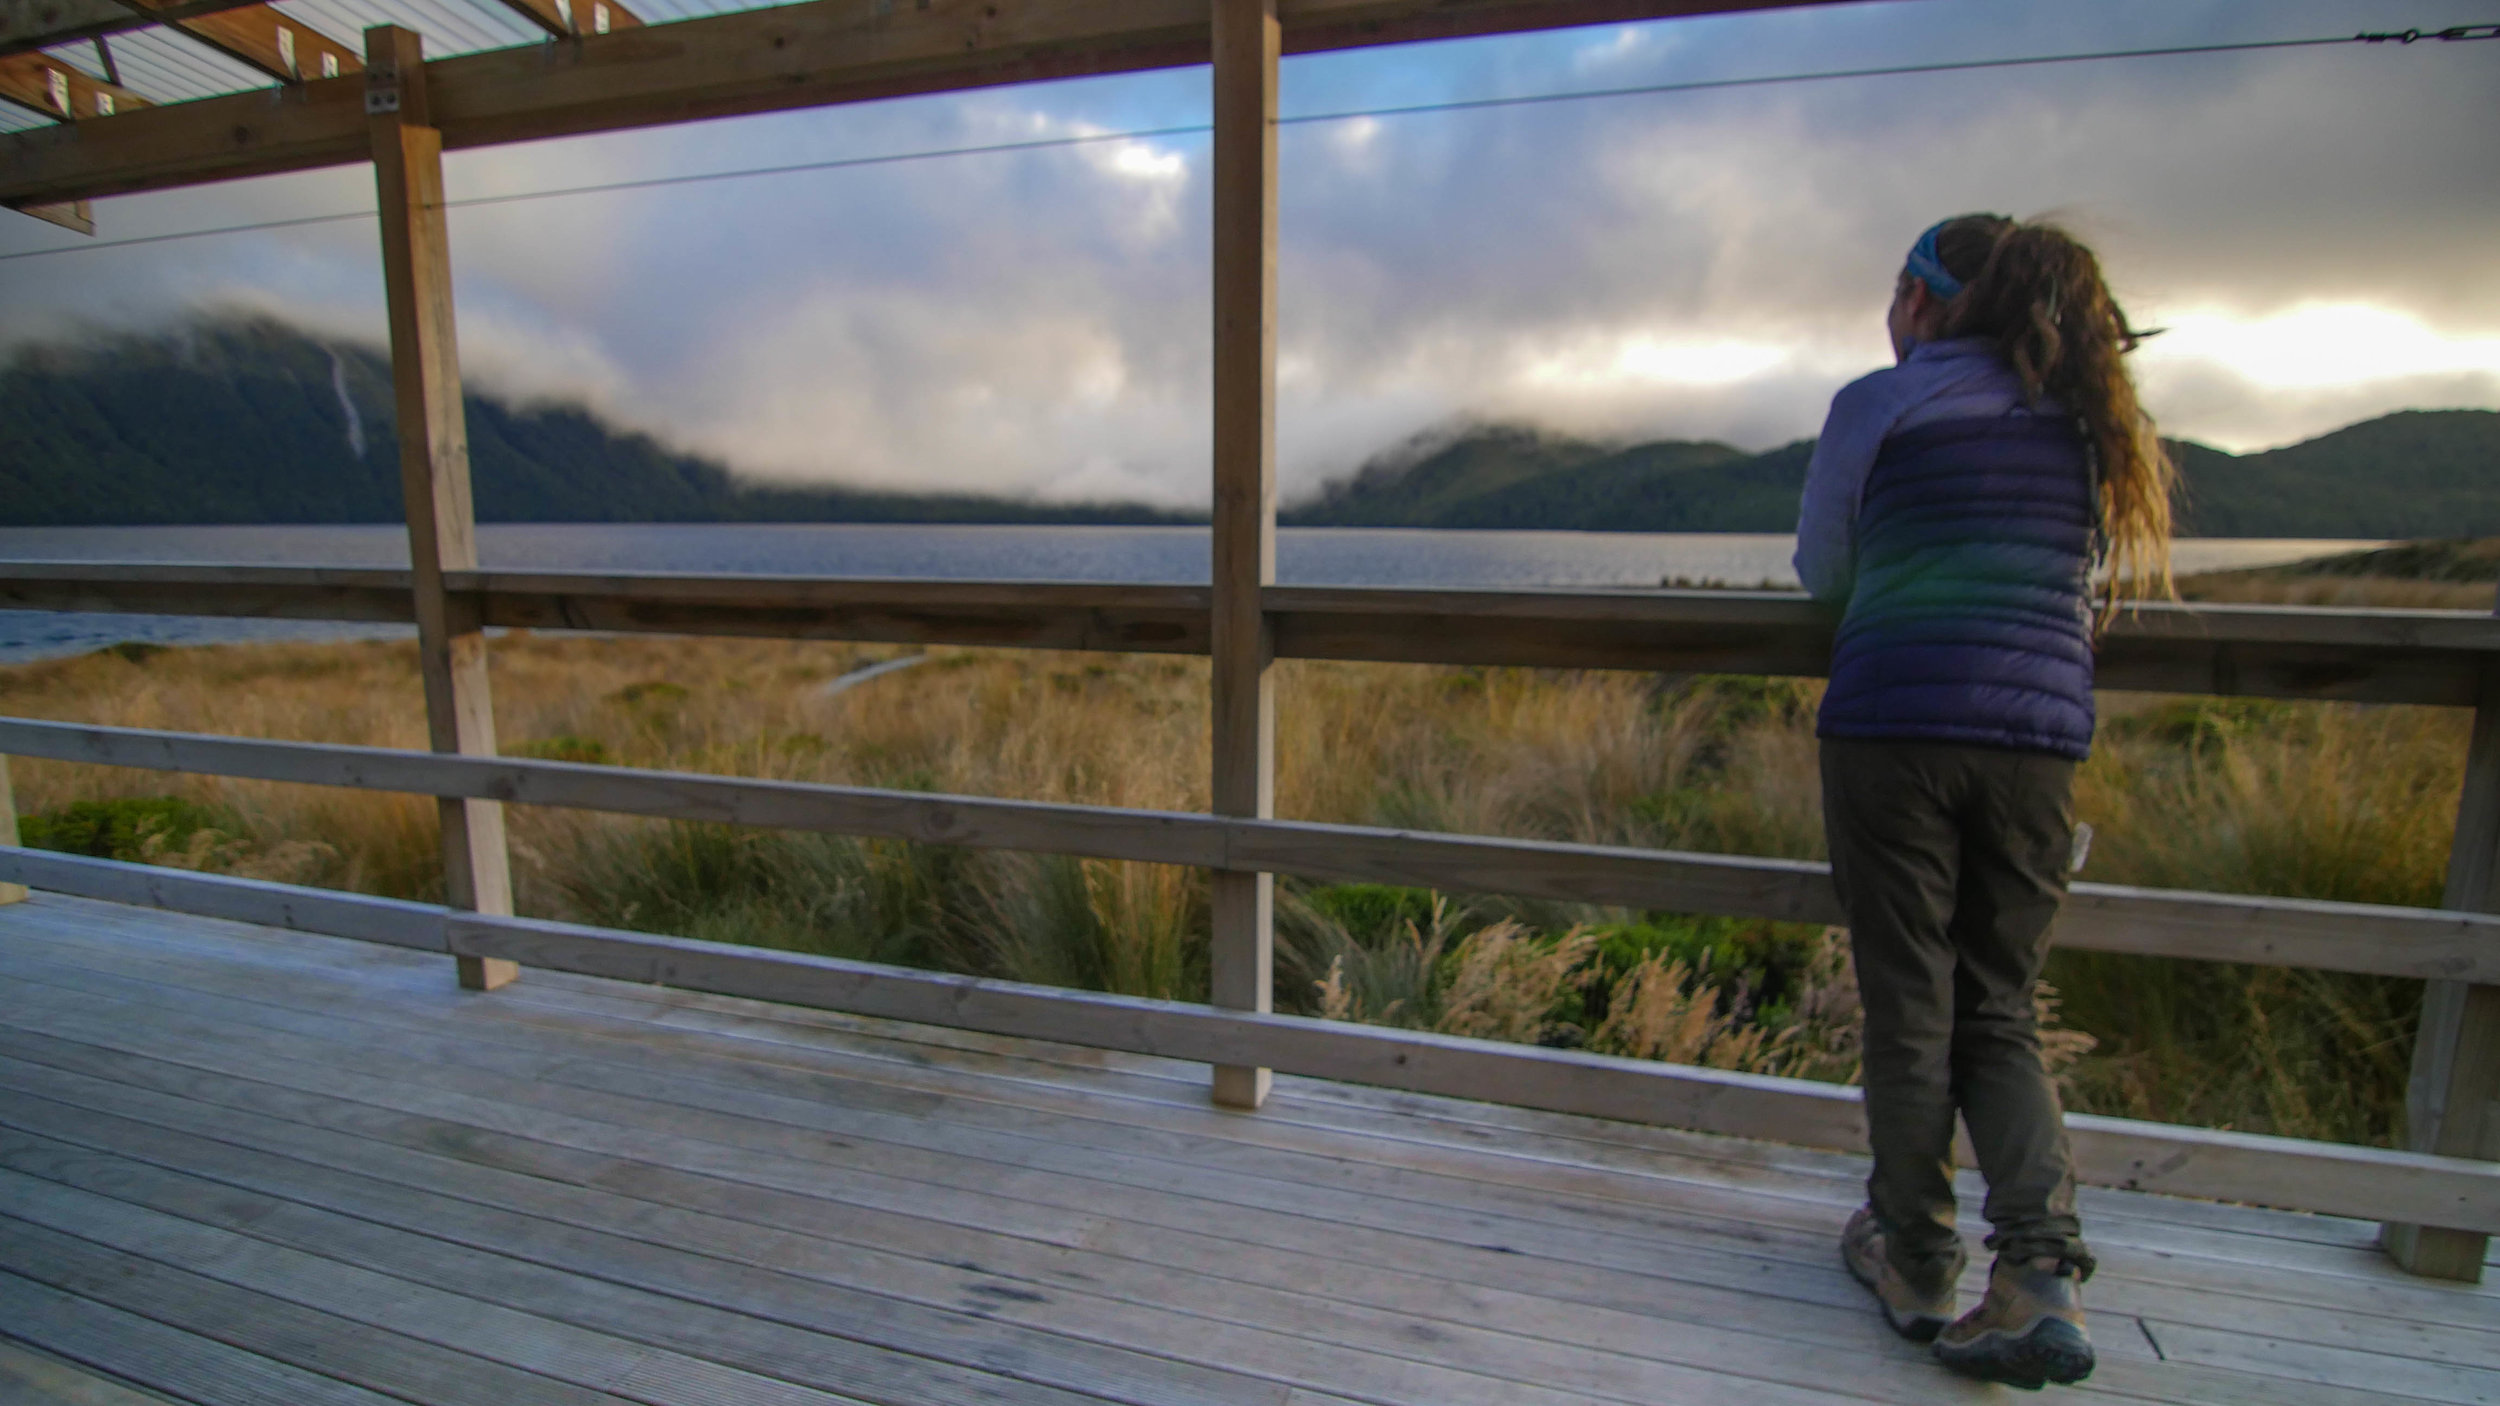 Green Lake Hut Lake Monowai Fiordland NAtional Park New Zealand (6 of 9).jpg